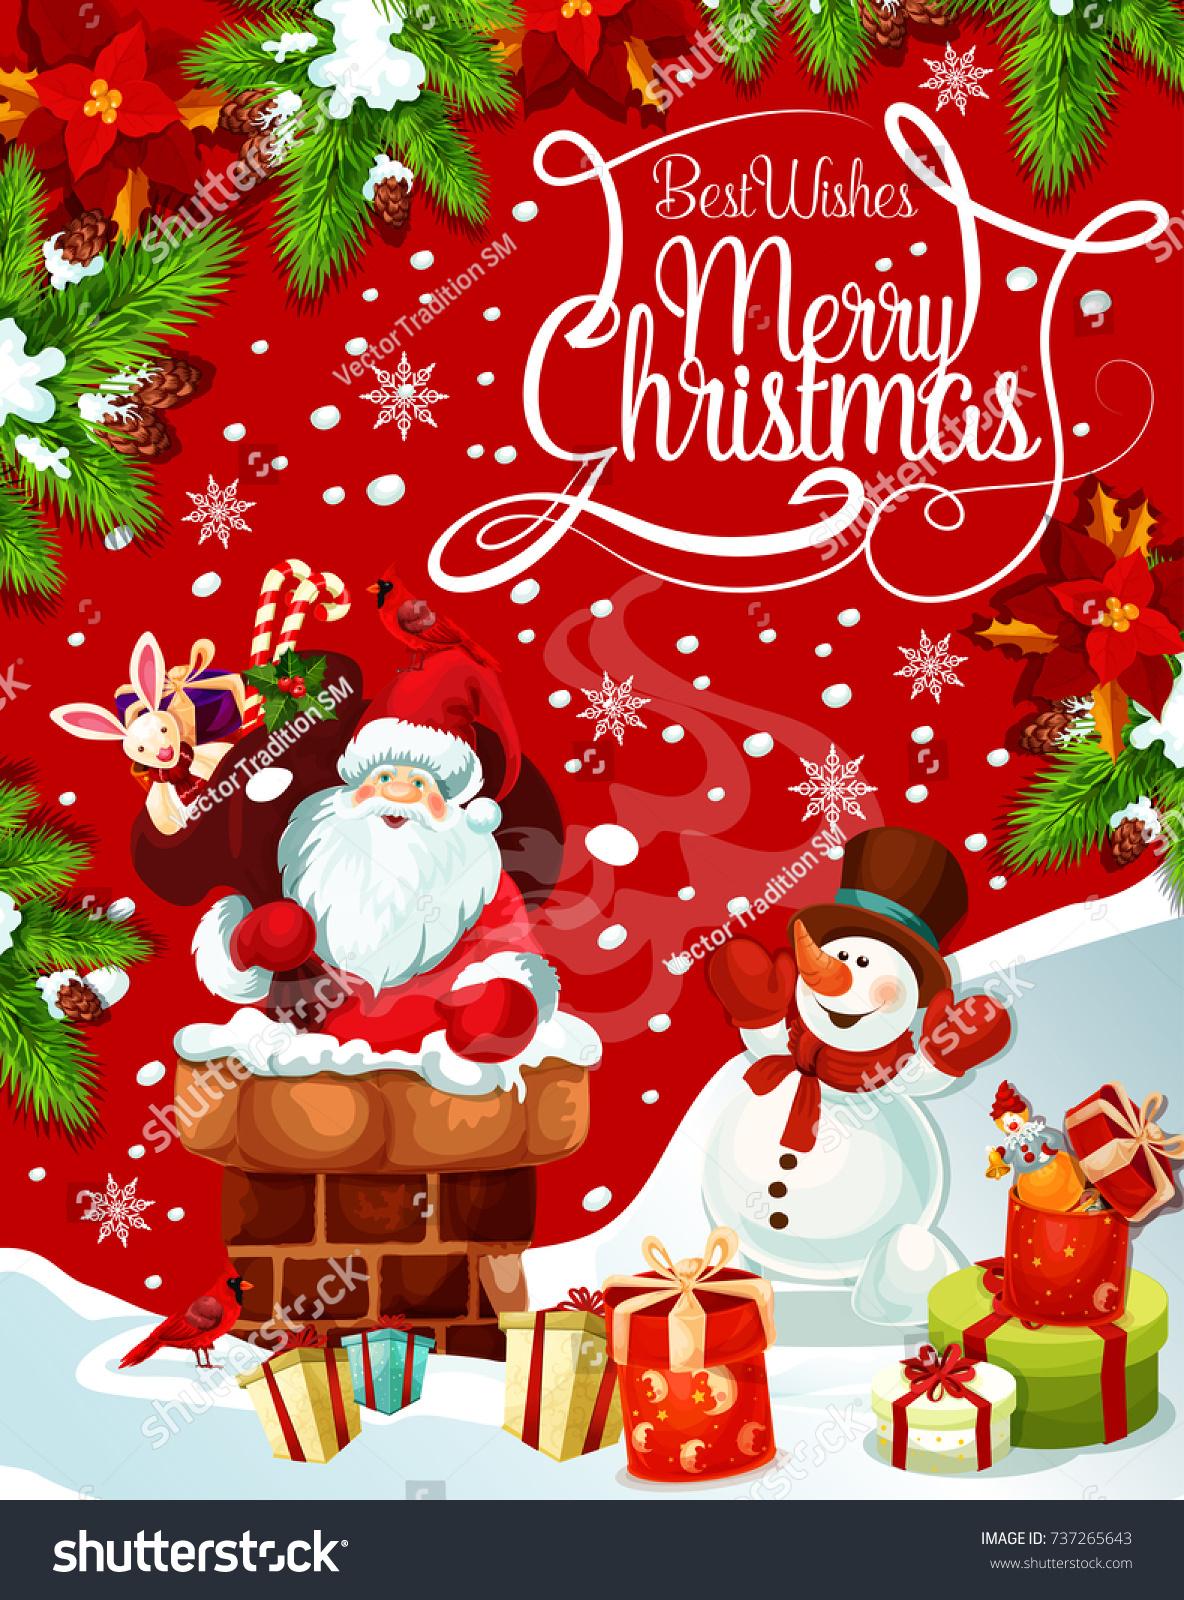 Merry Christmas Greeting Card Santa Chimney Stock Vector